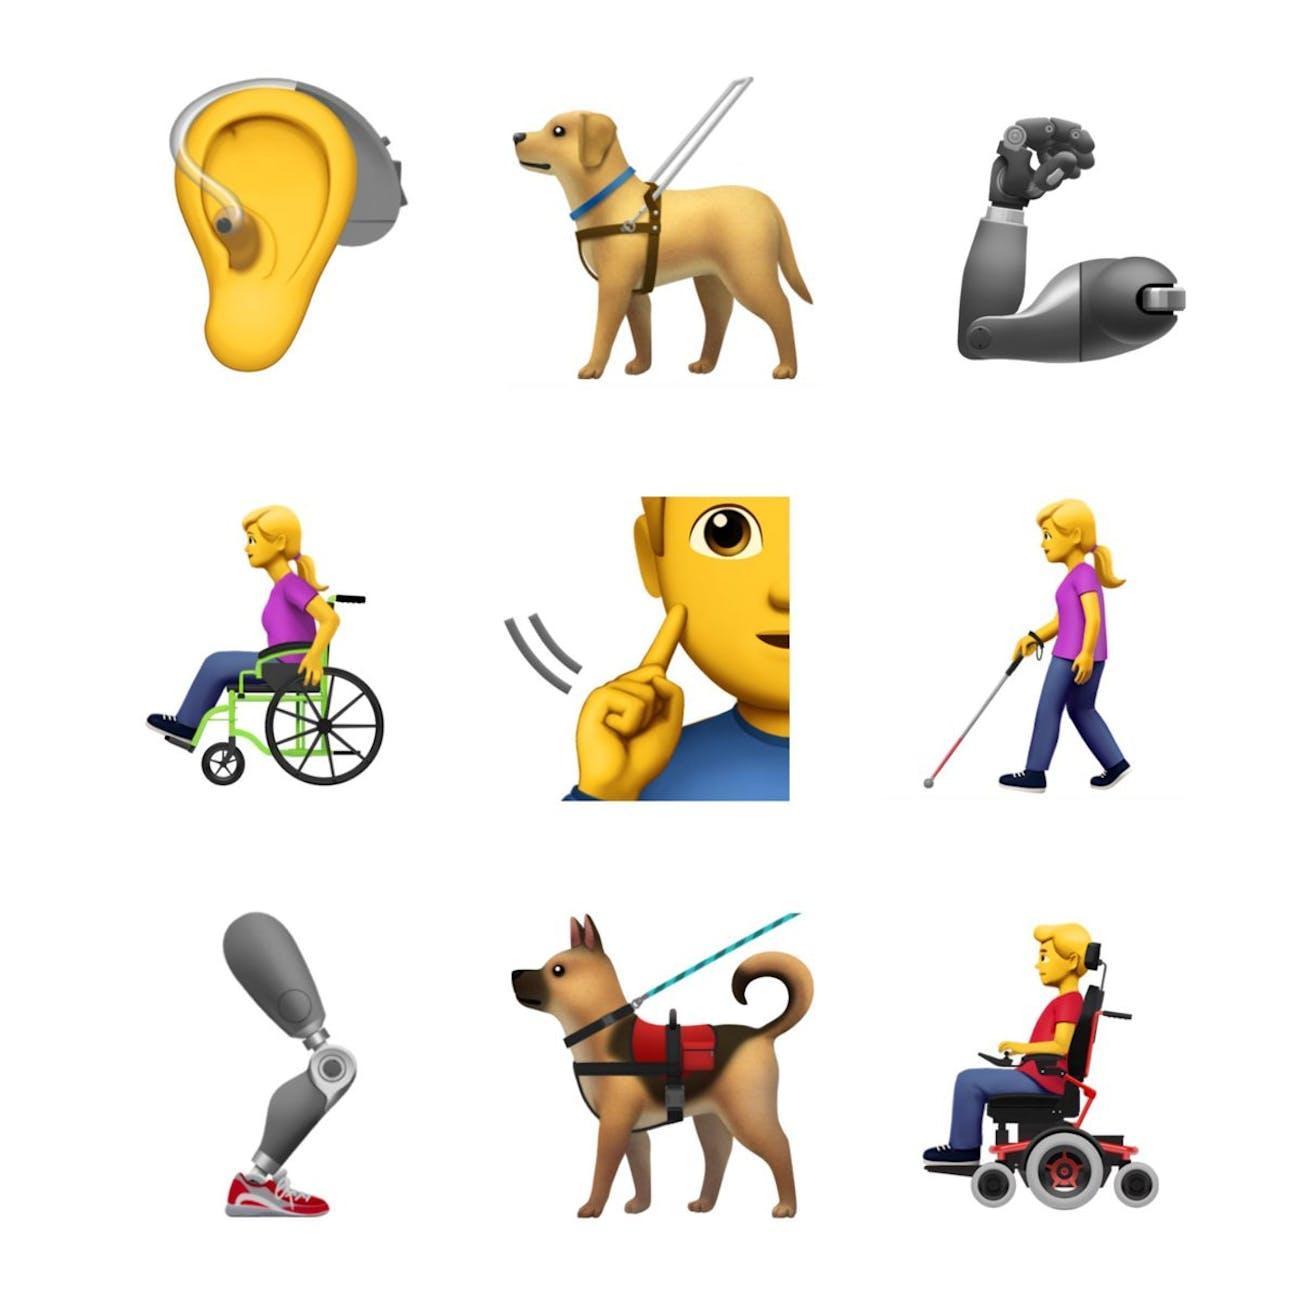 Accessibility emojis